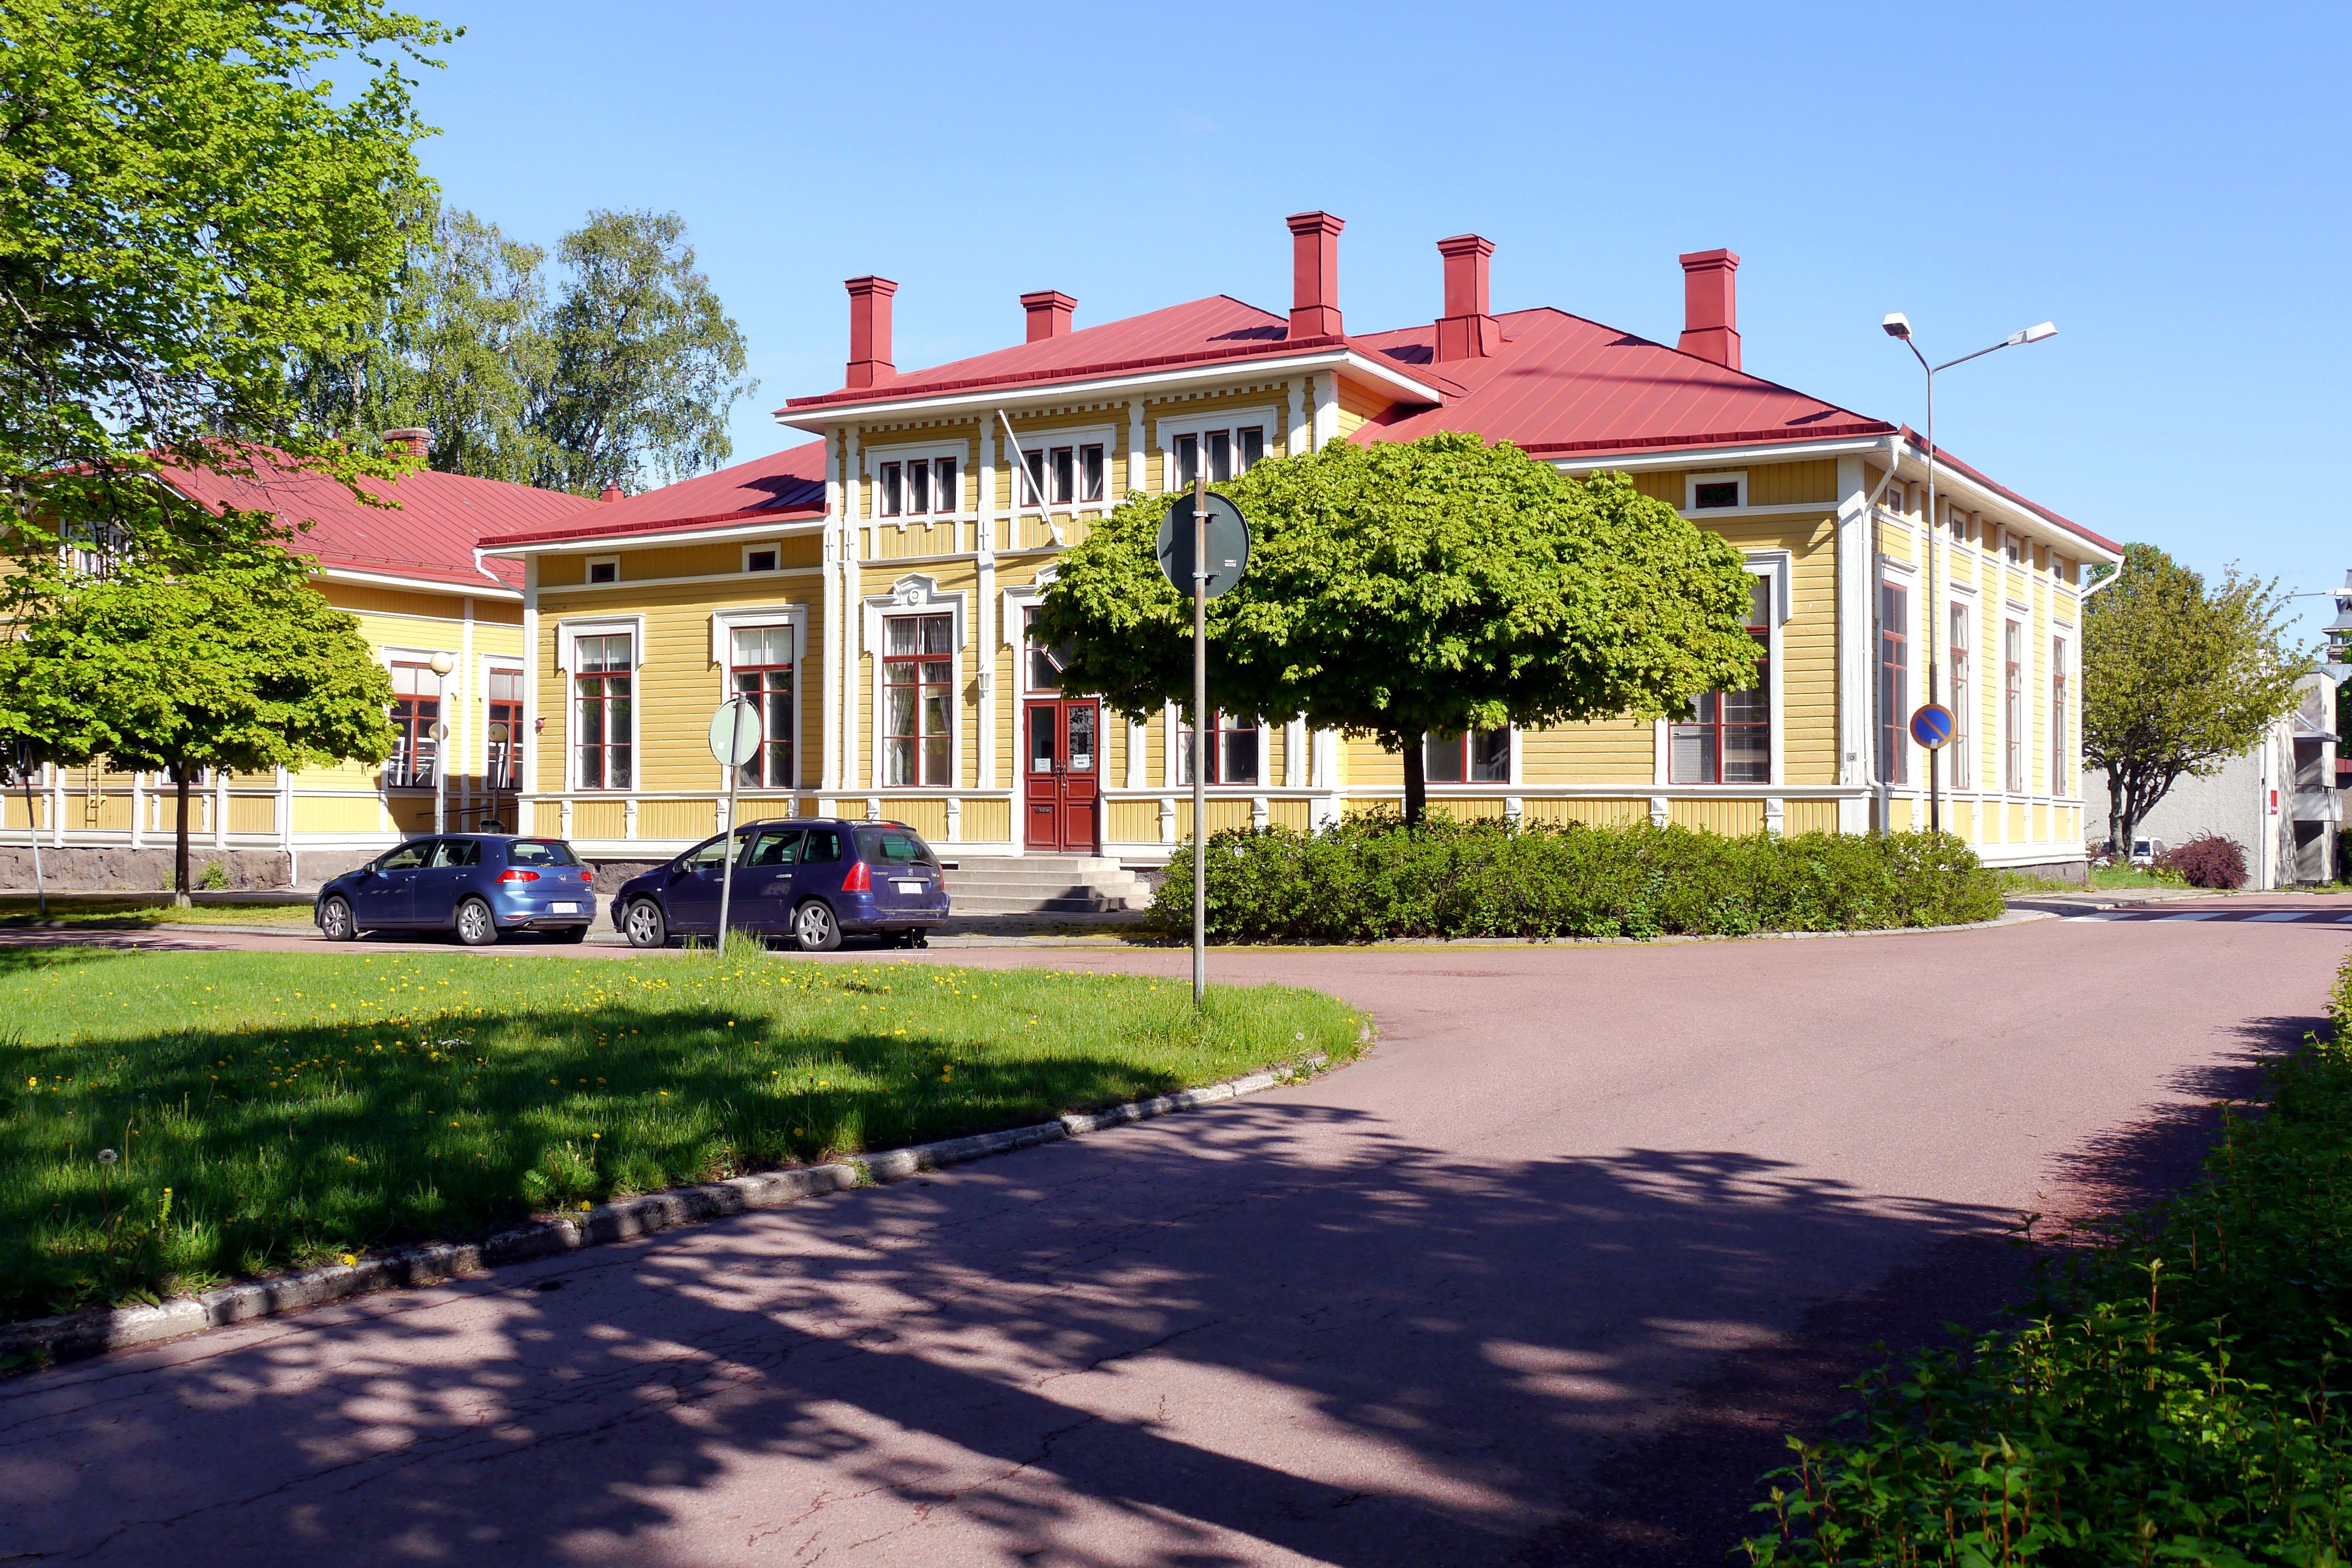 Mariehamn-Aland Inseln